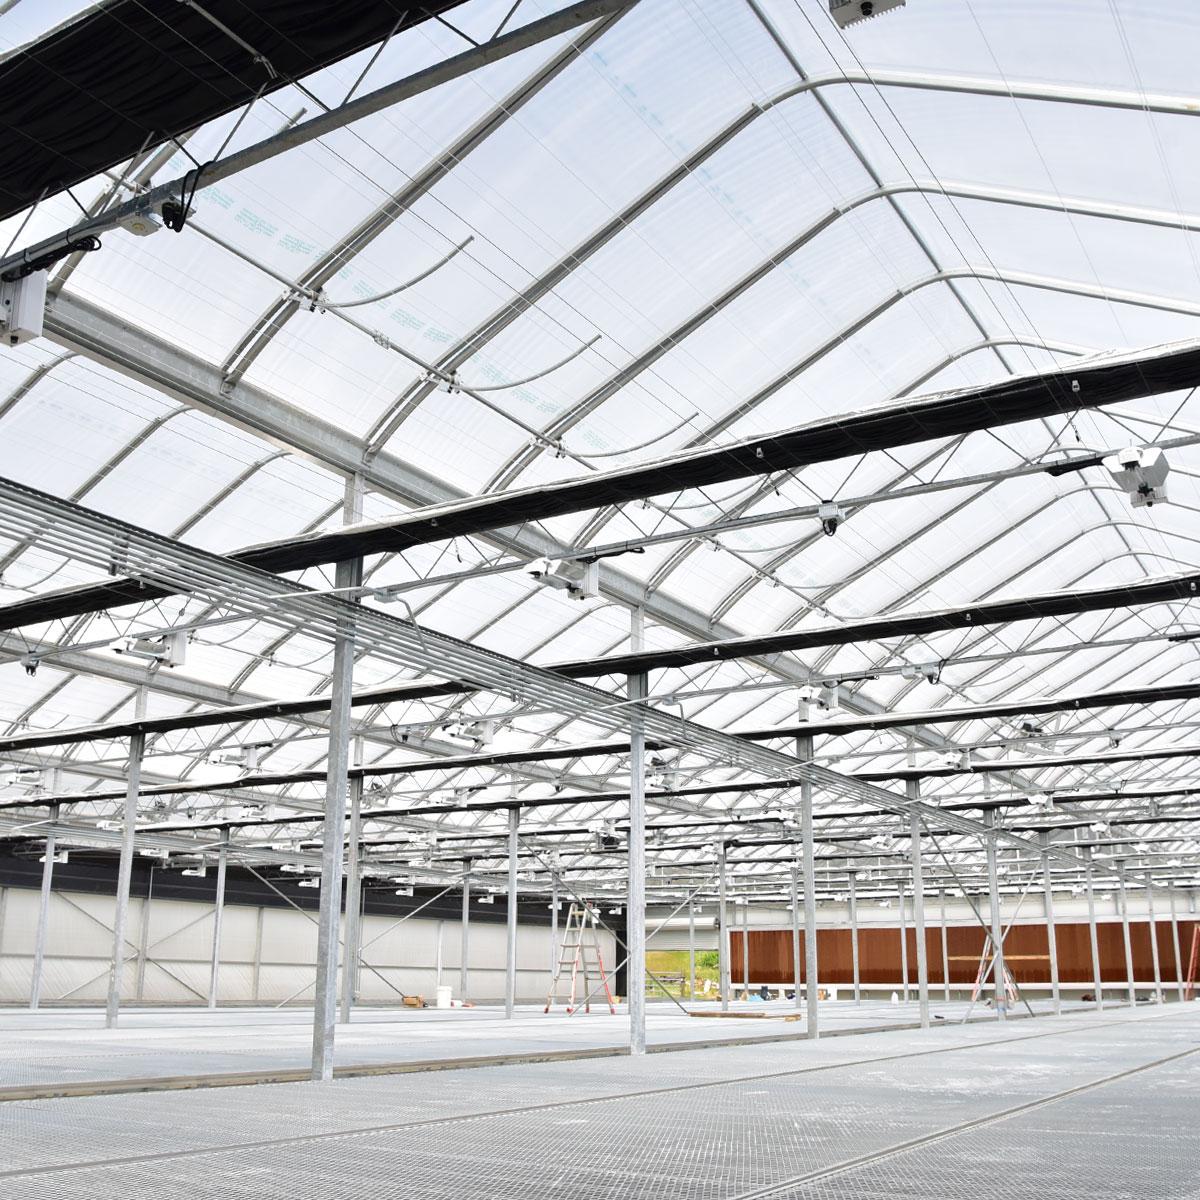 Gutter Connect Greenhouse interior framework